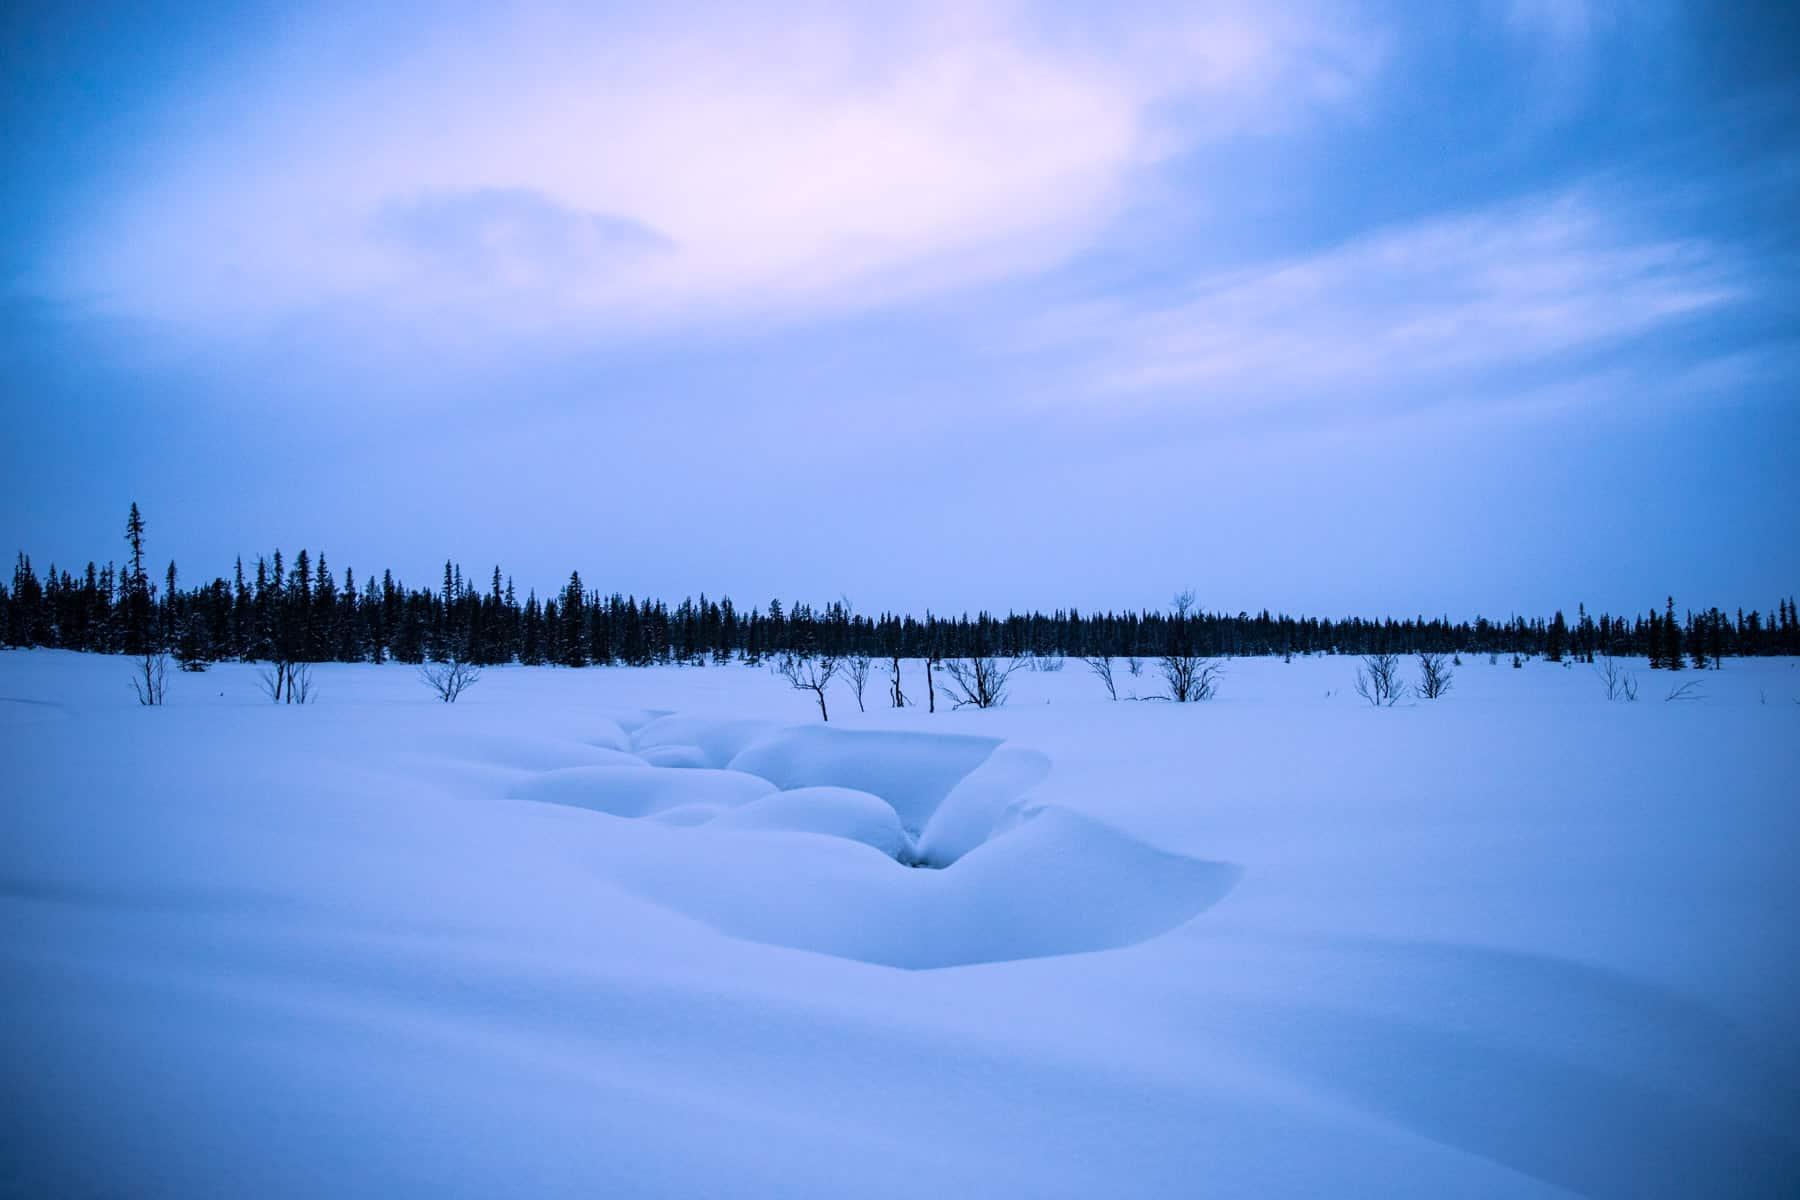 nordic-lappland-winter-landscape